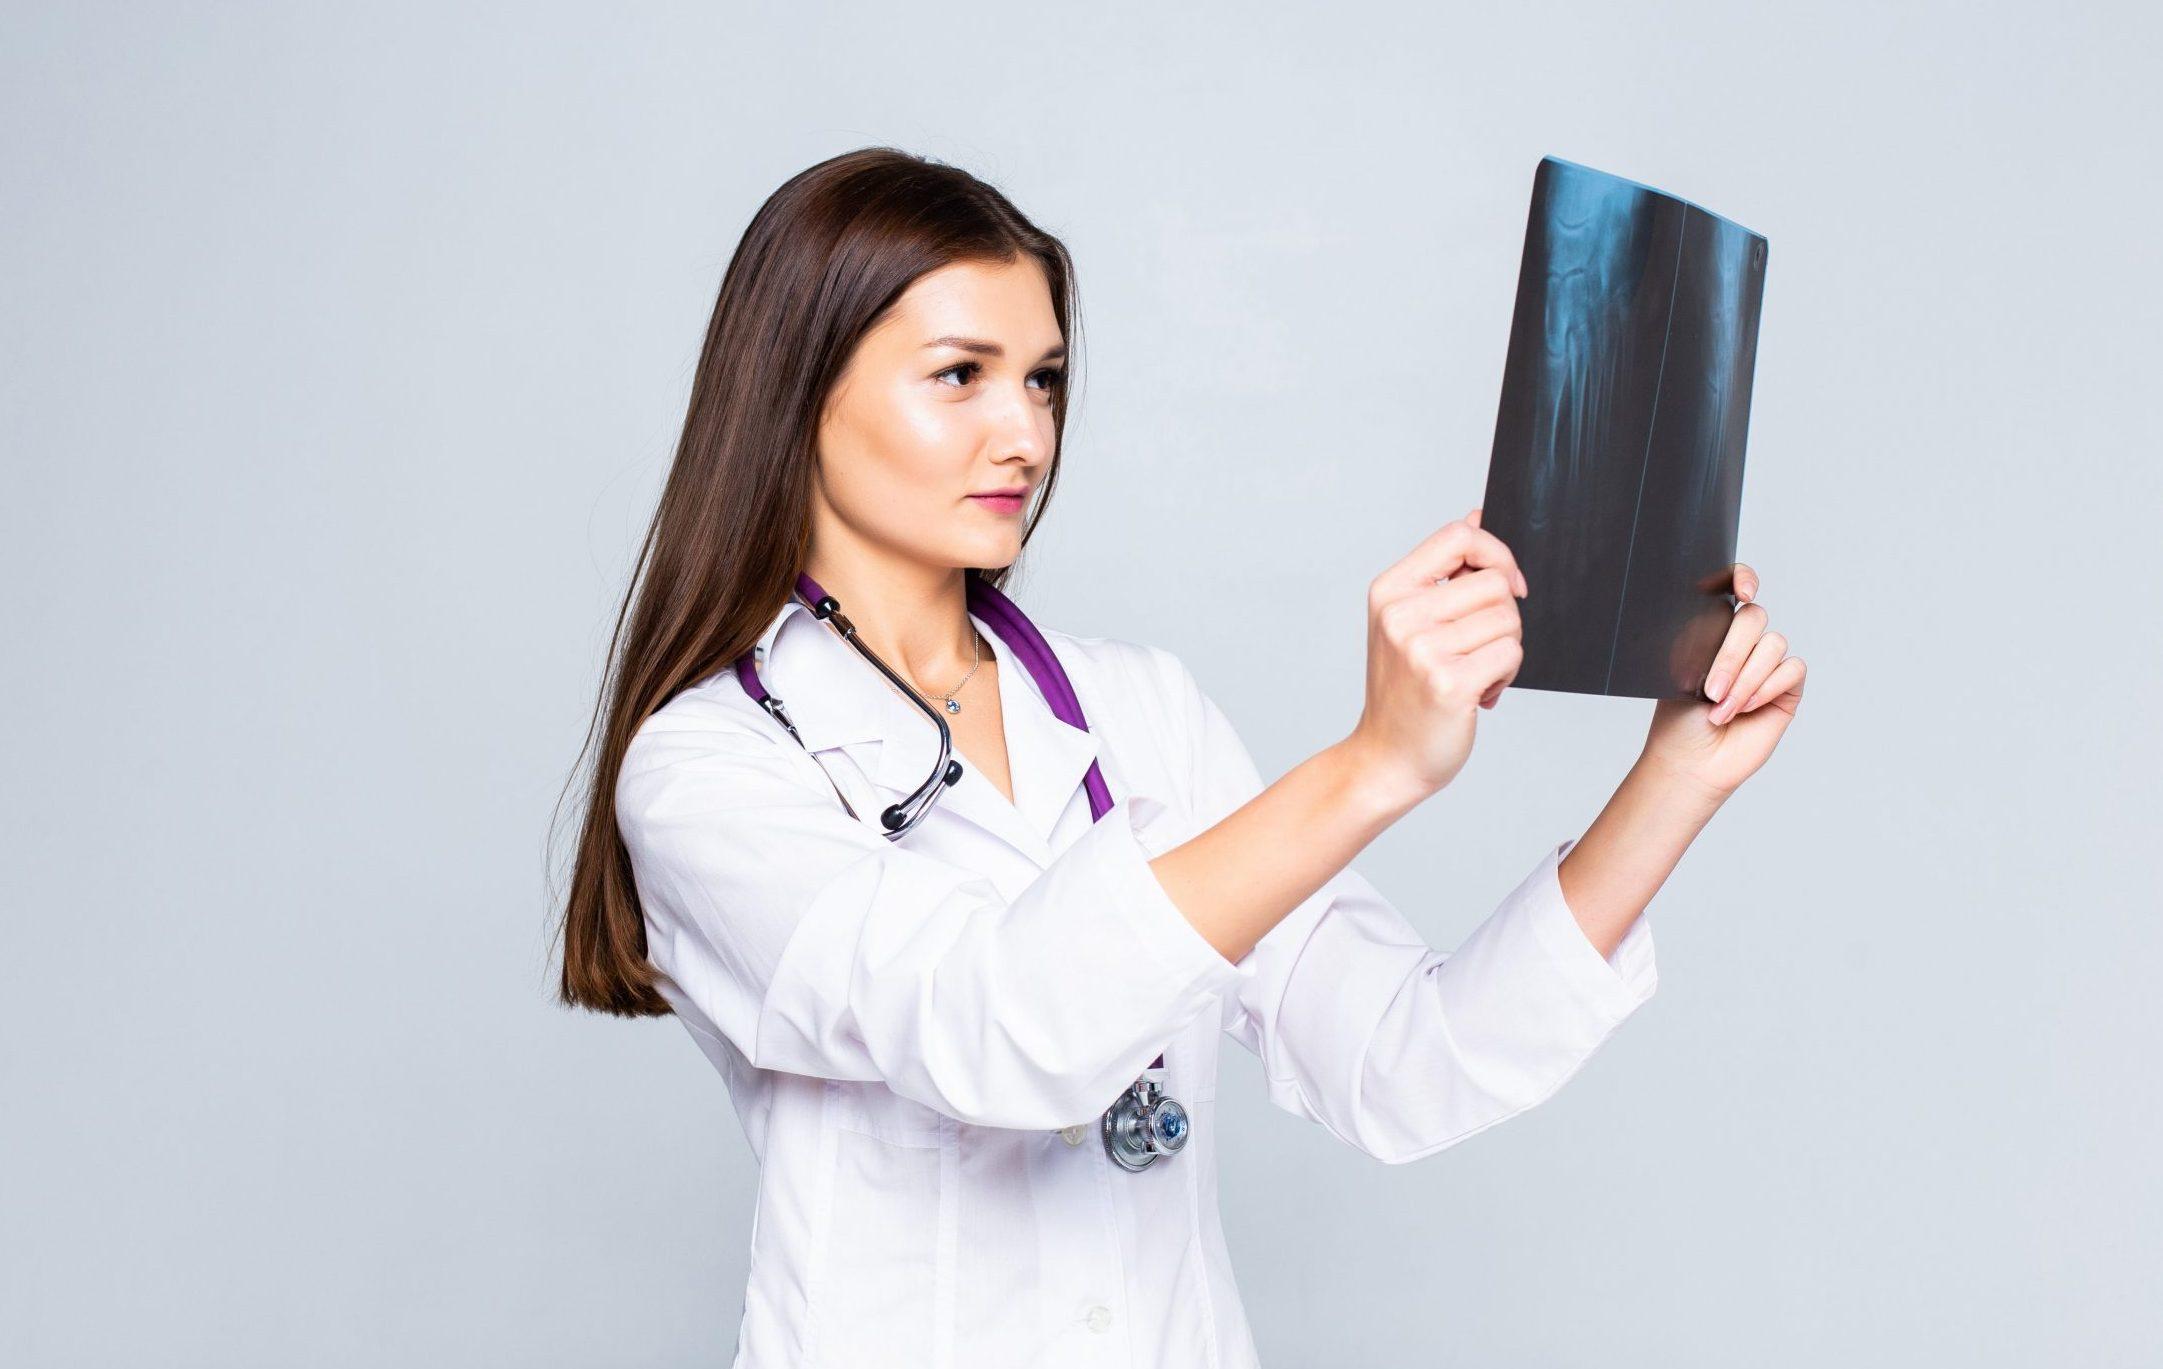 diagnostico precoz del cancer de mama